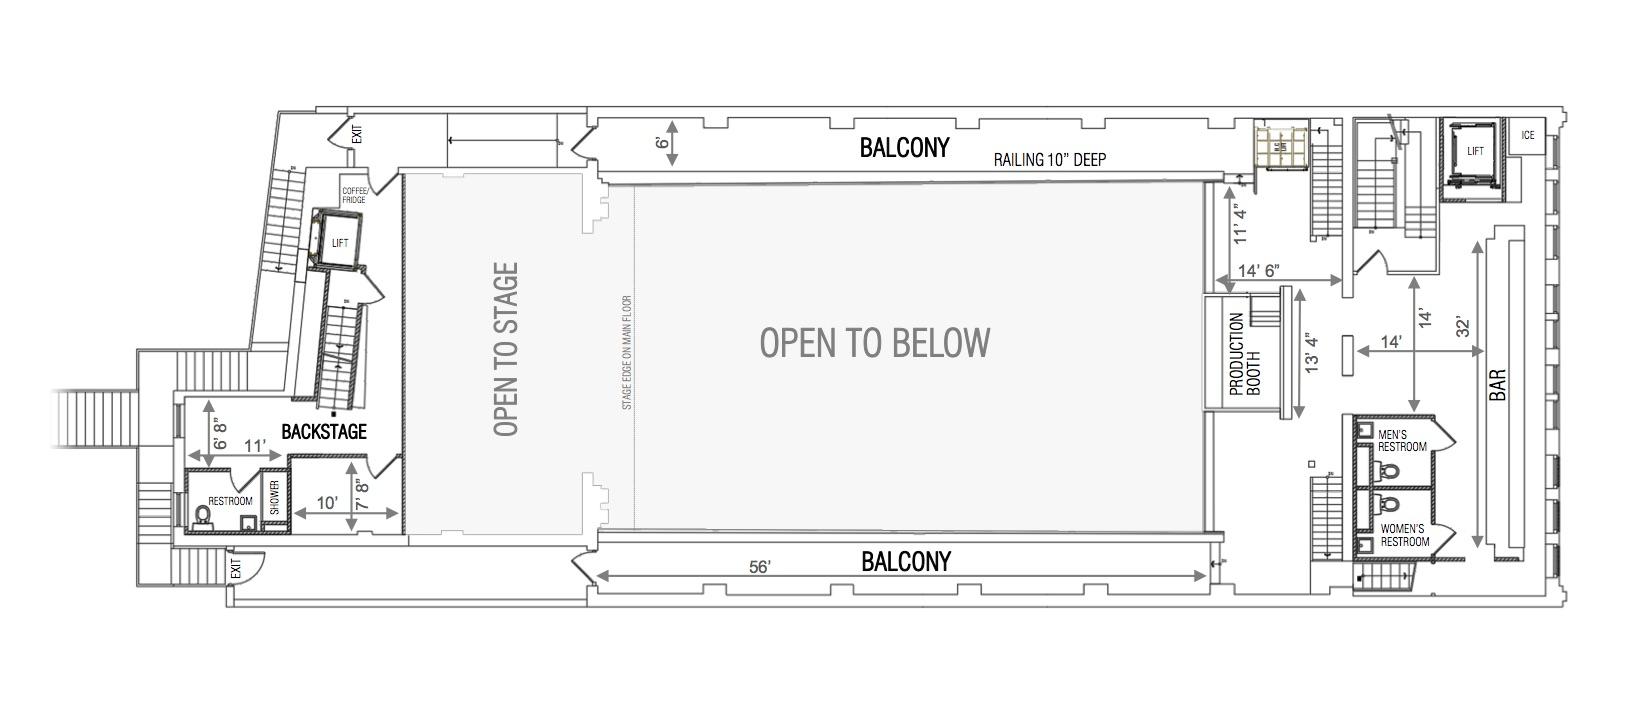 White Eagle Hall Balcony Floor Plan - source:http://www.whiteeaglehalljc.com/about/